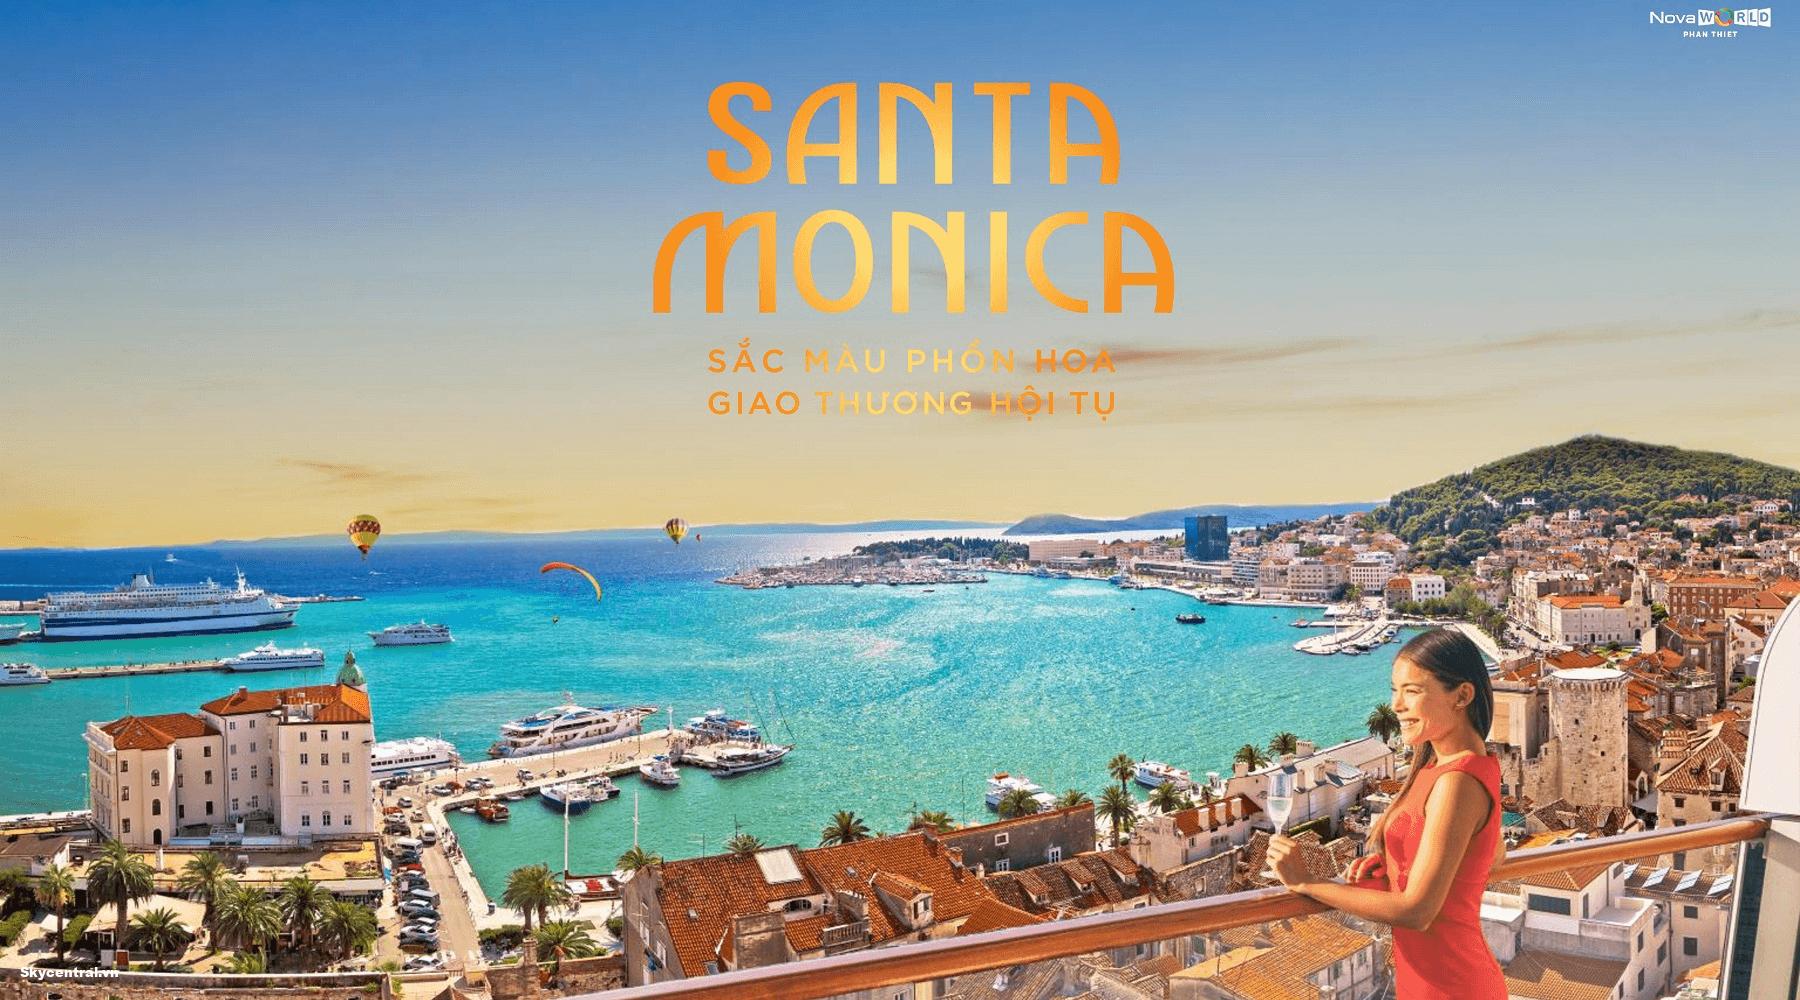 Giá bán Santa Monica